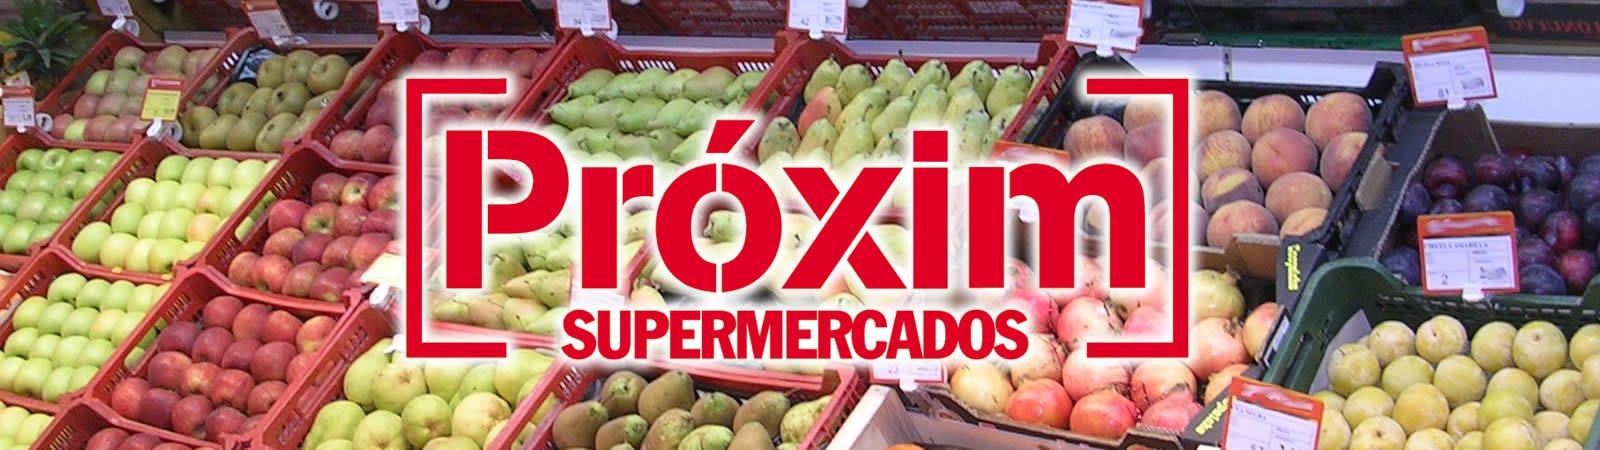 supermercado sant antoni ibiza